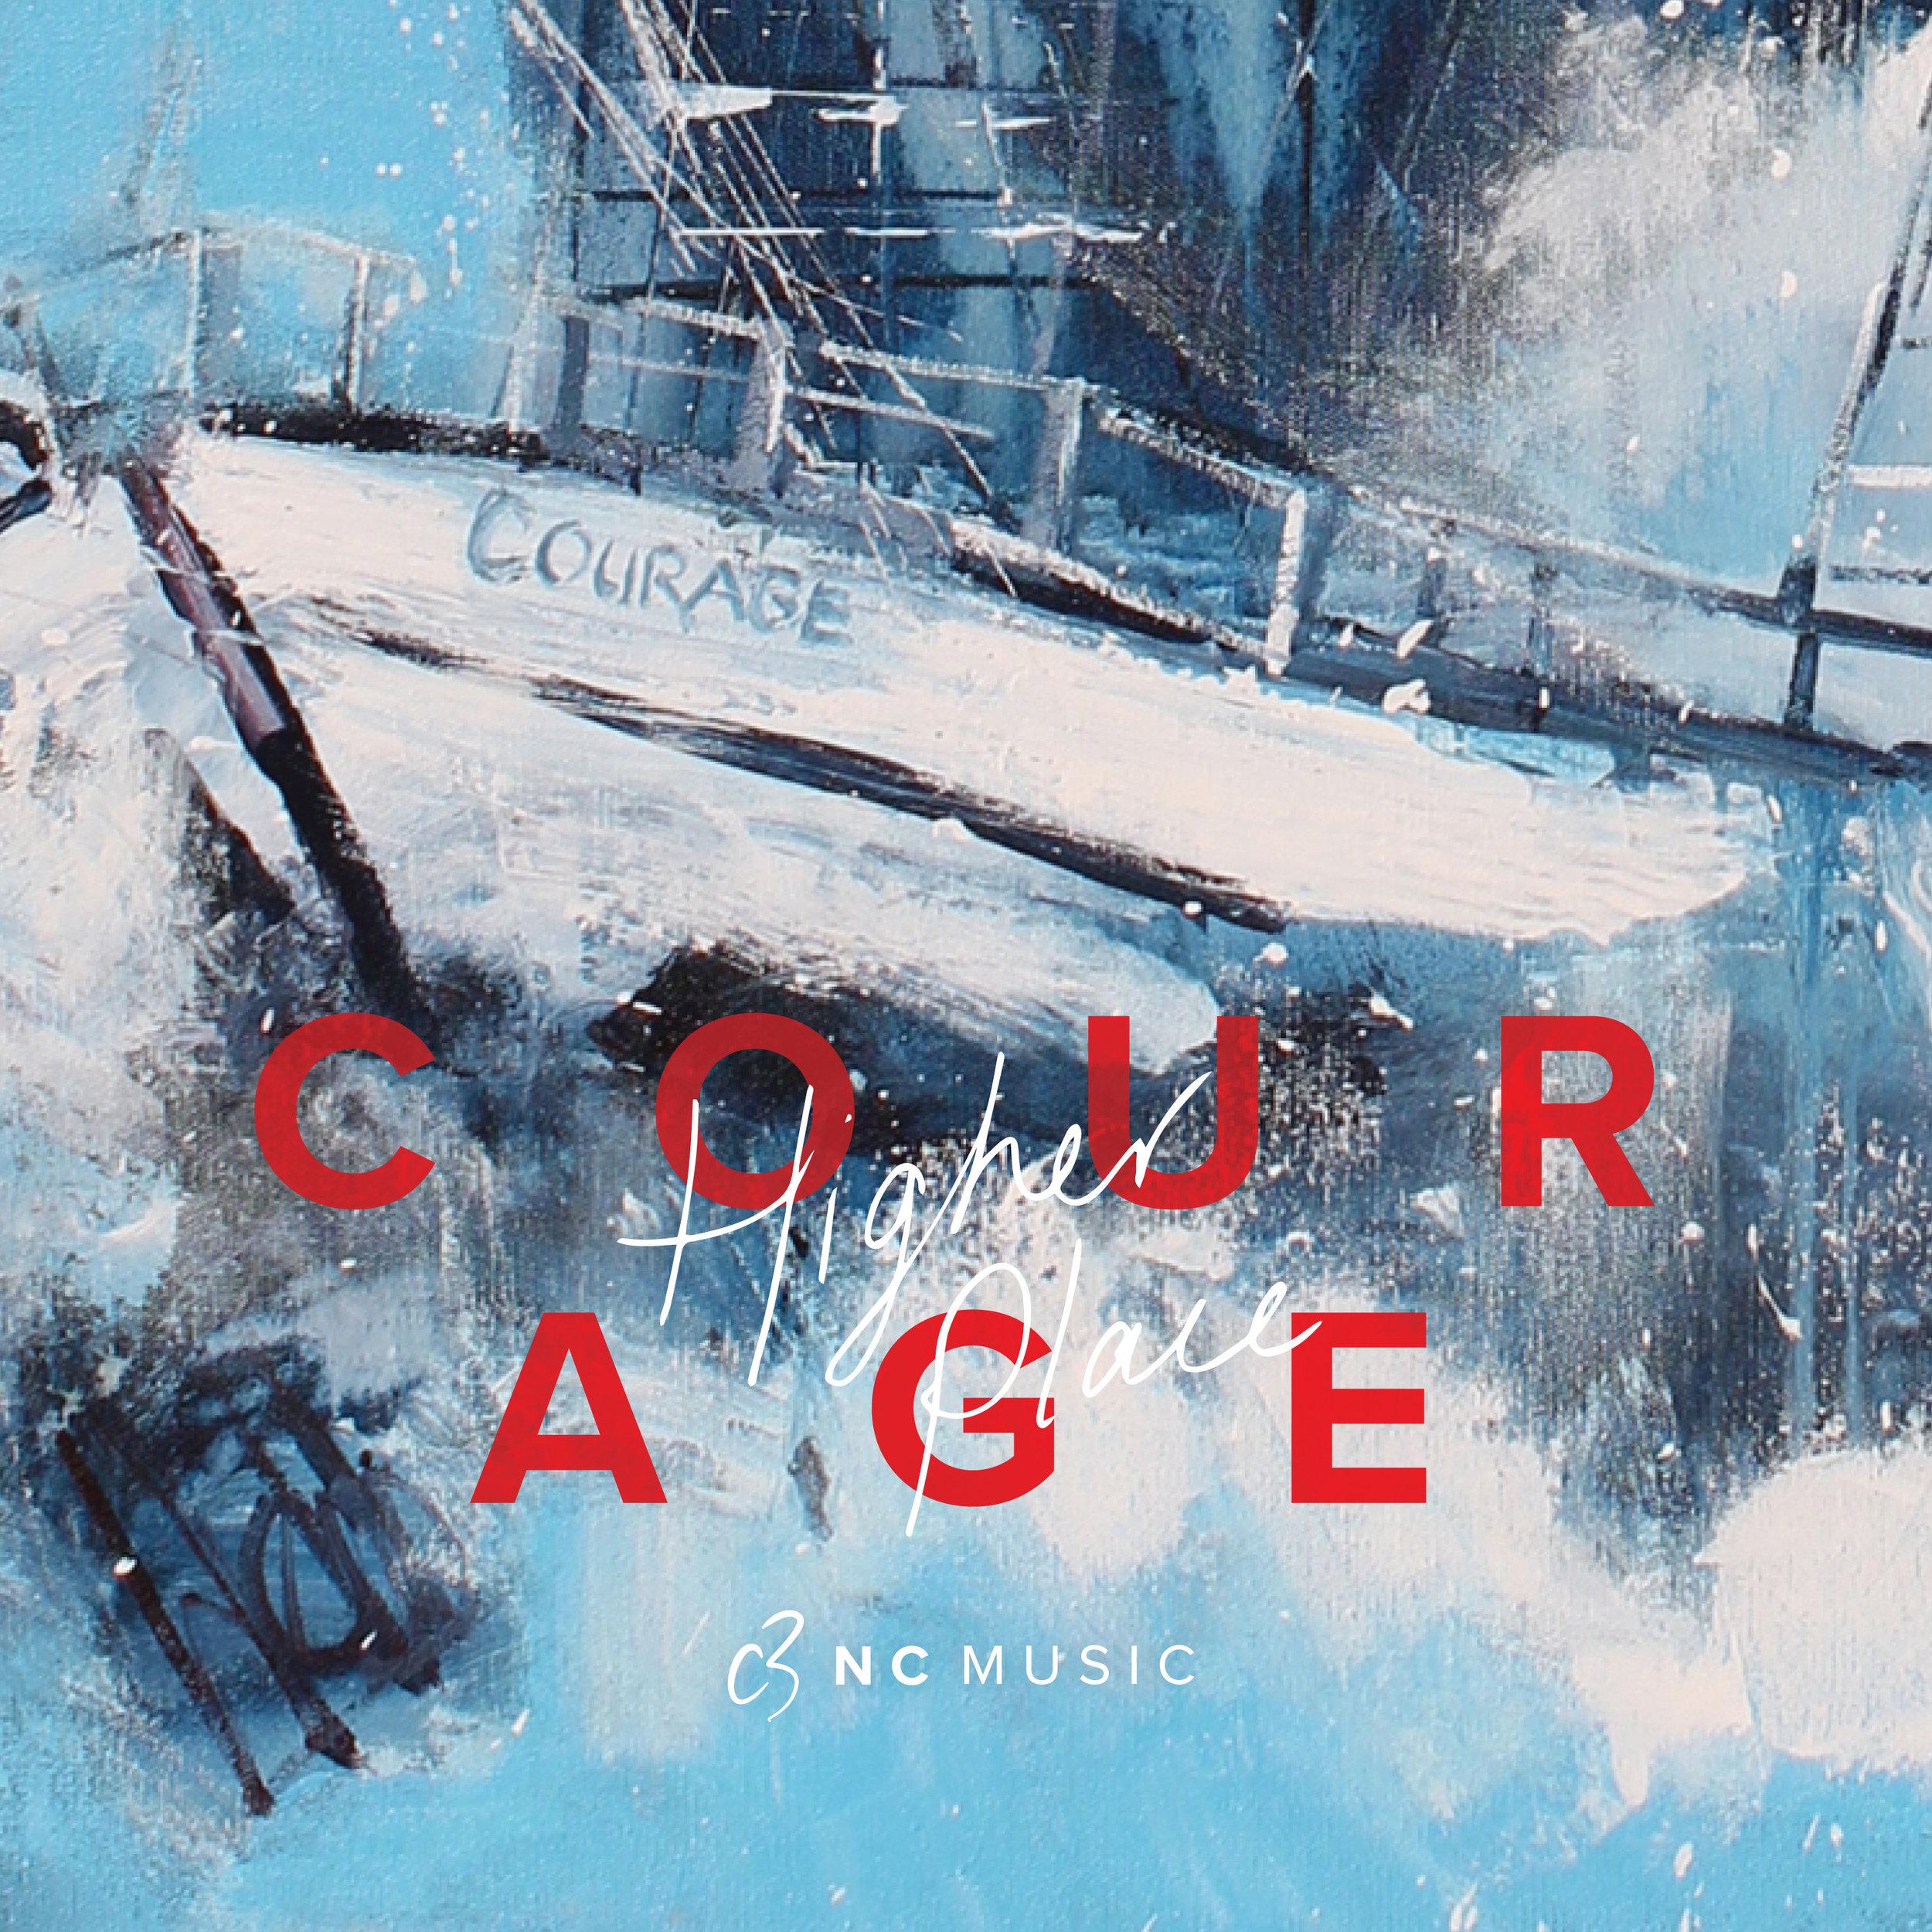 3-Courage-3000x3000.jpg